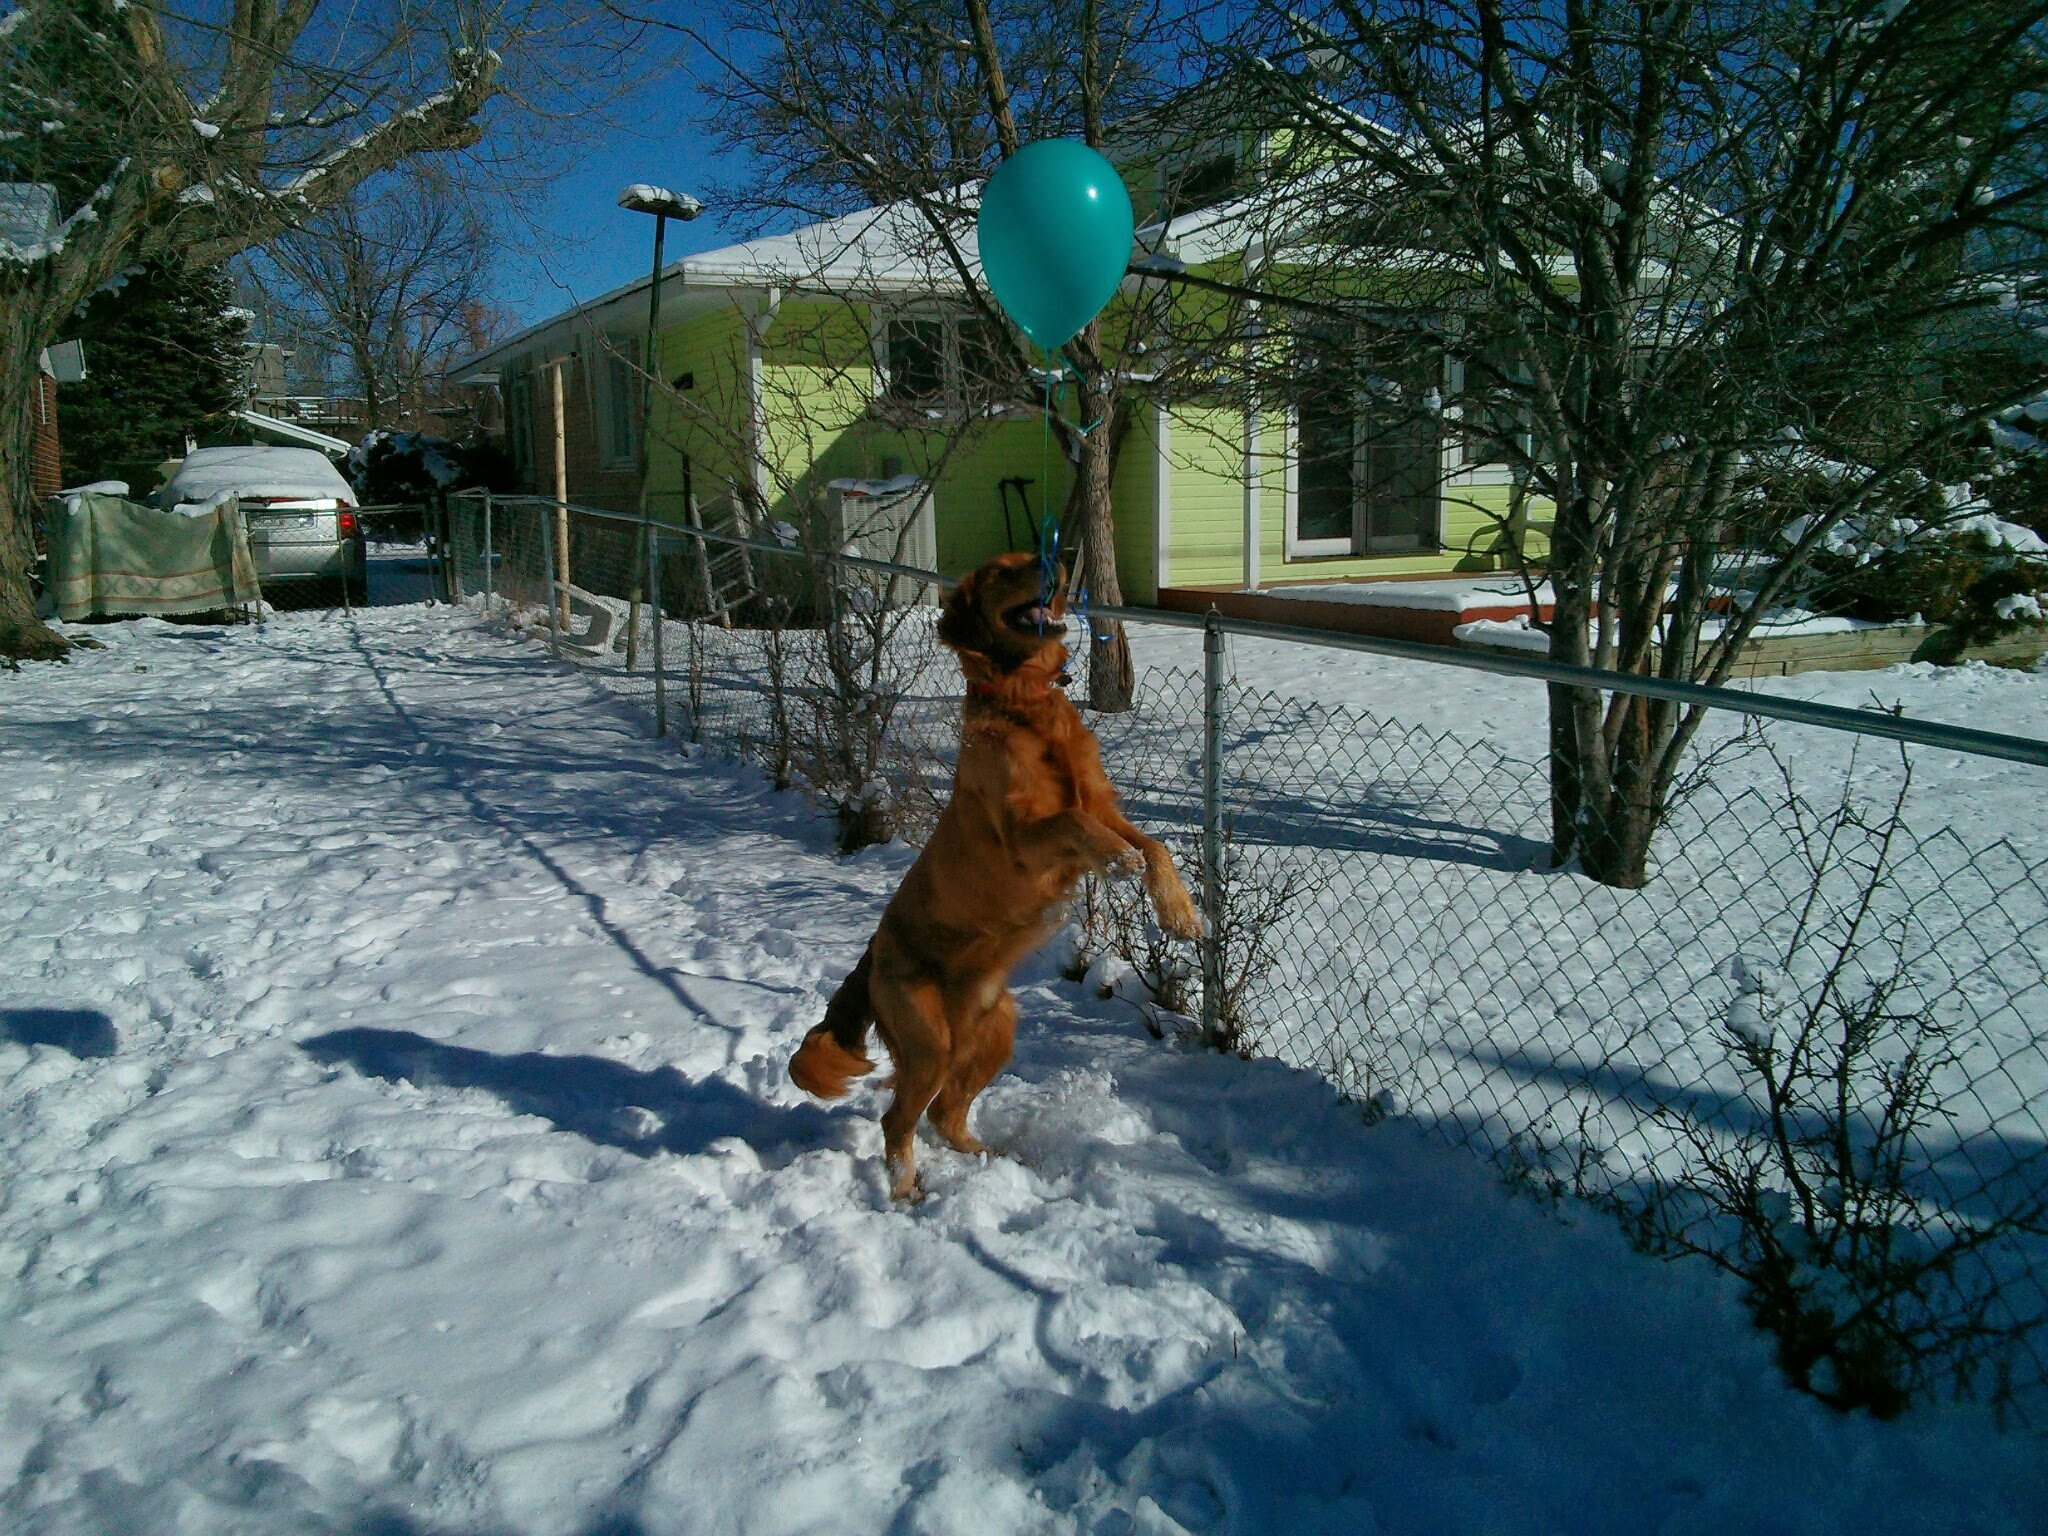 Bender the golden retriever jumps for the balloon